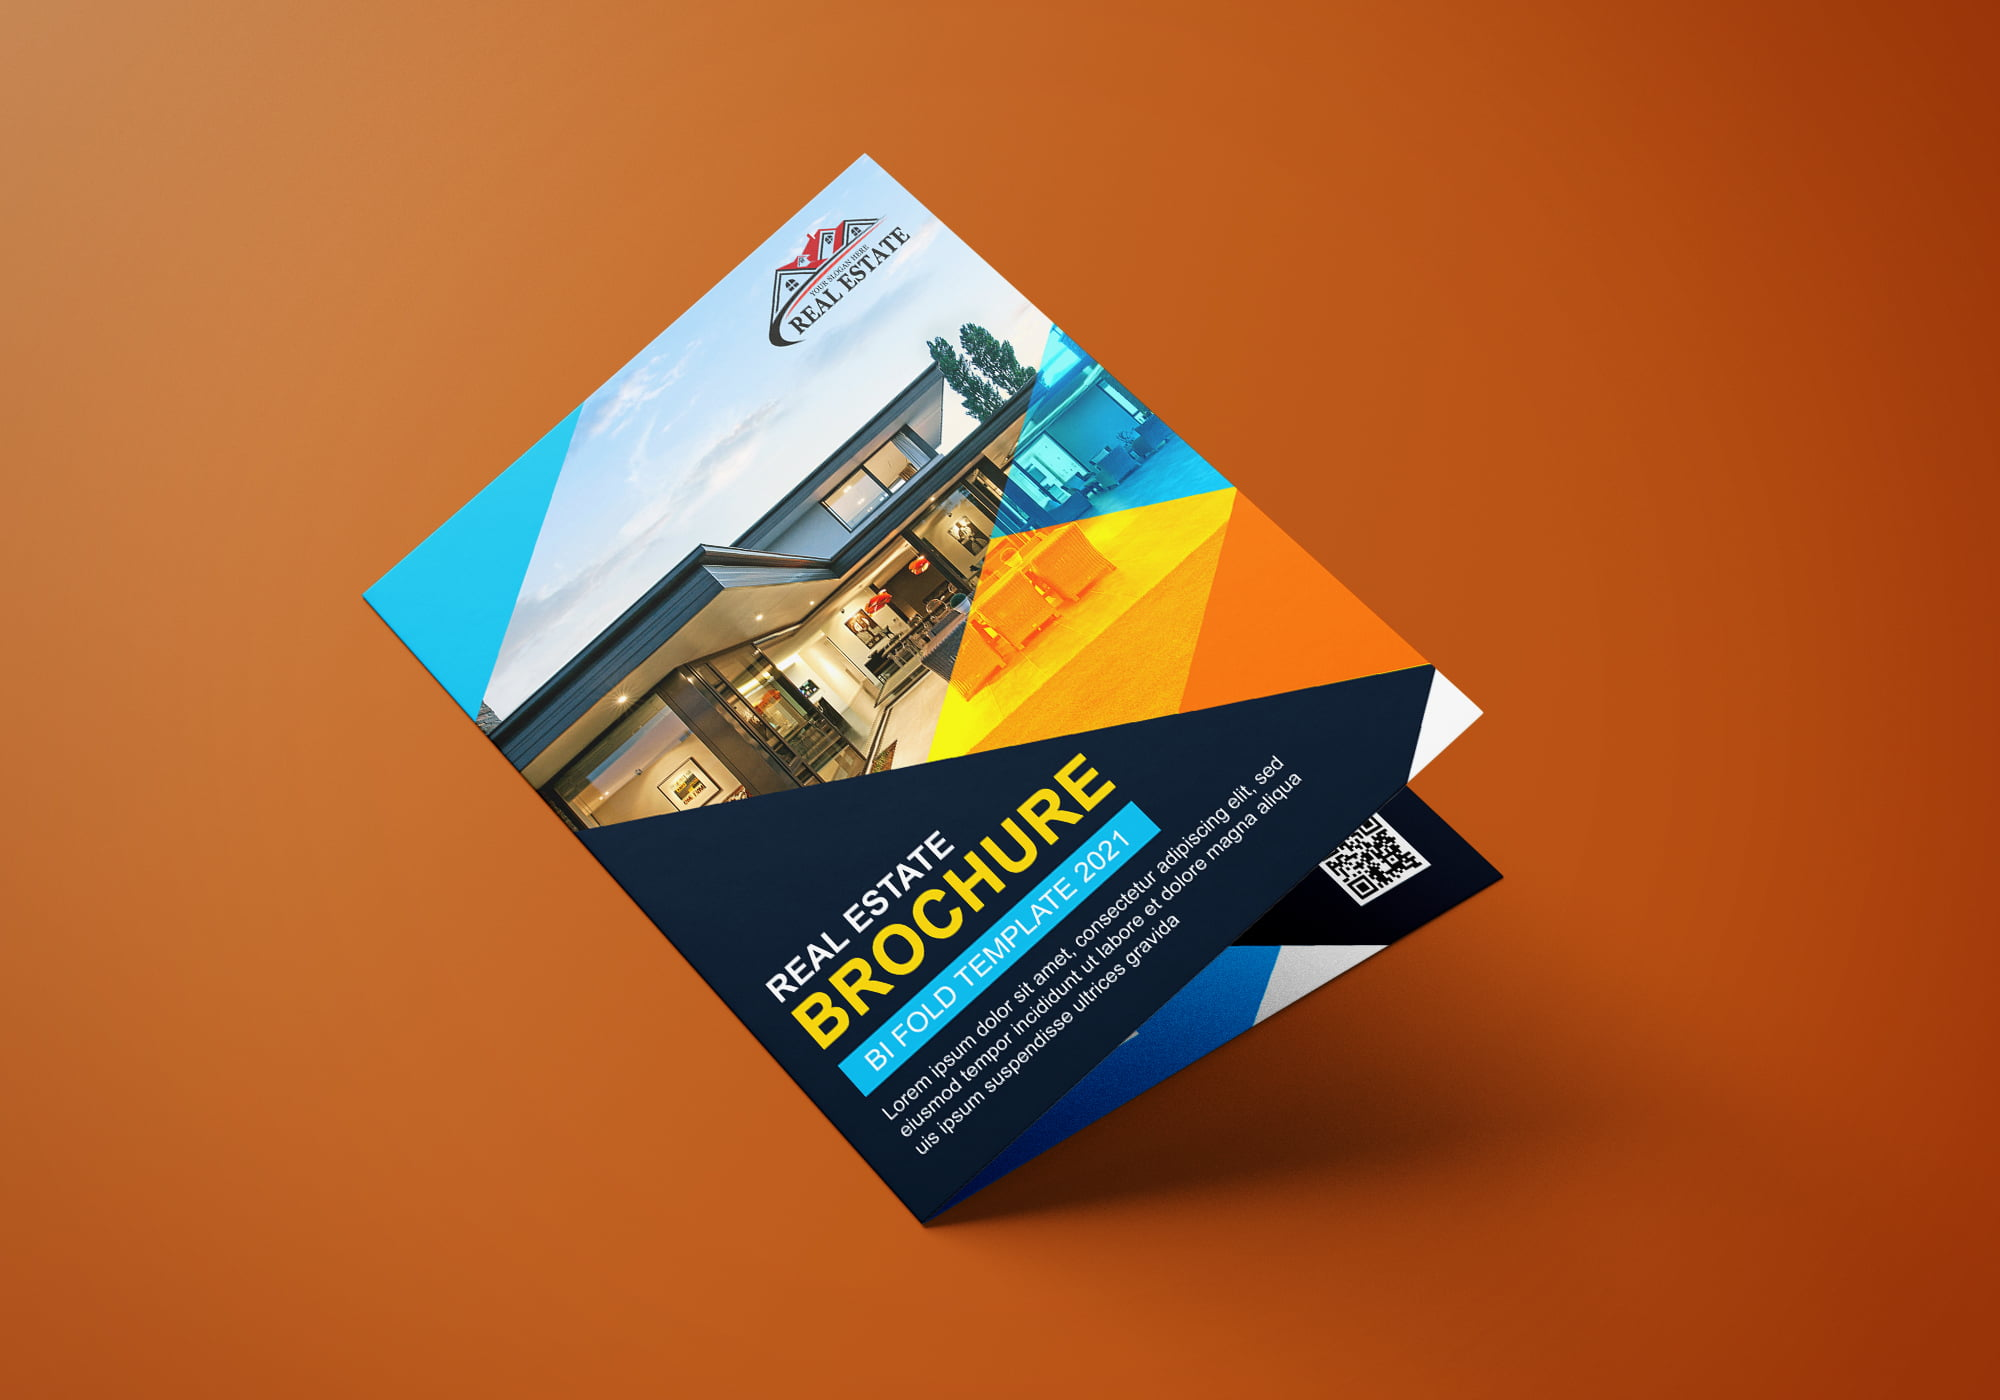 Download Editable Bi Fold Brochure Design for Photoshop